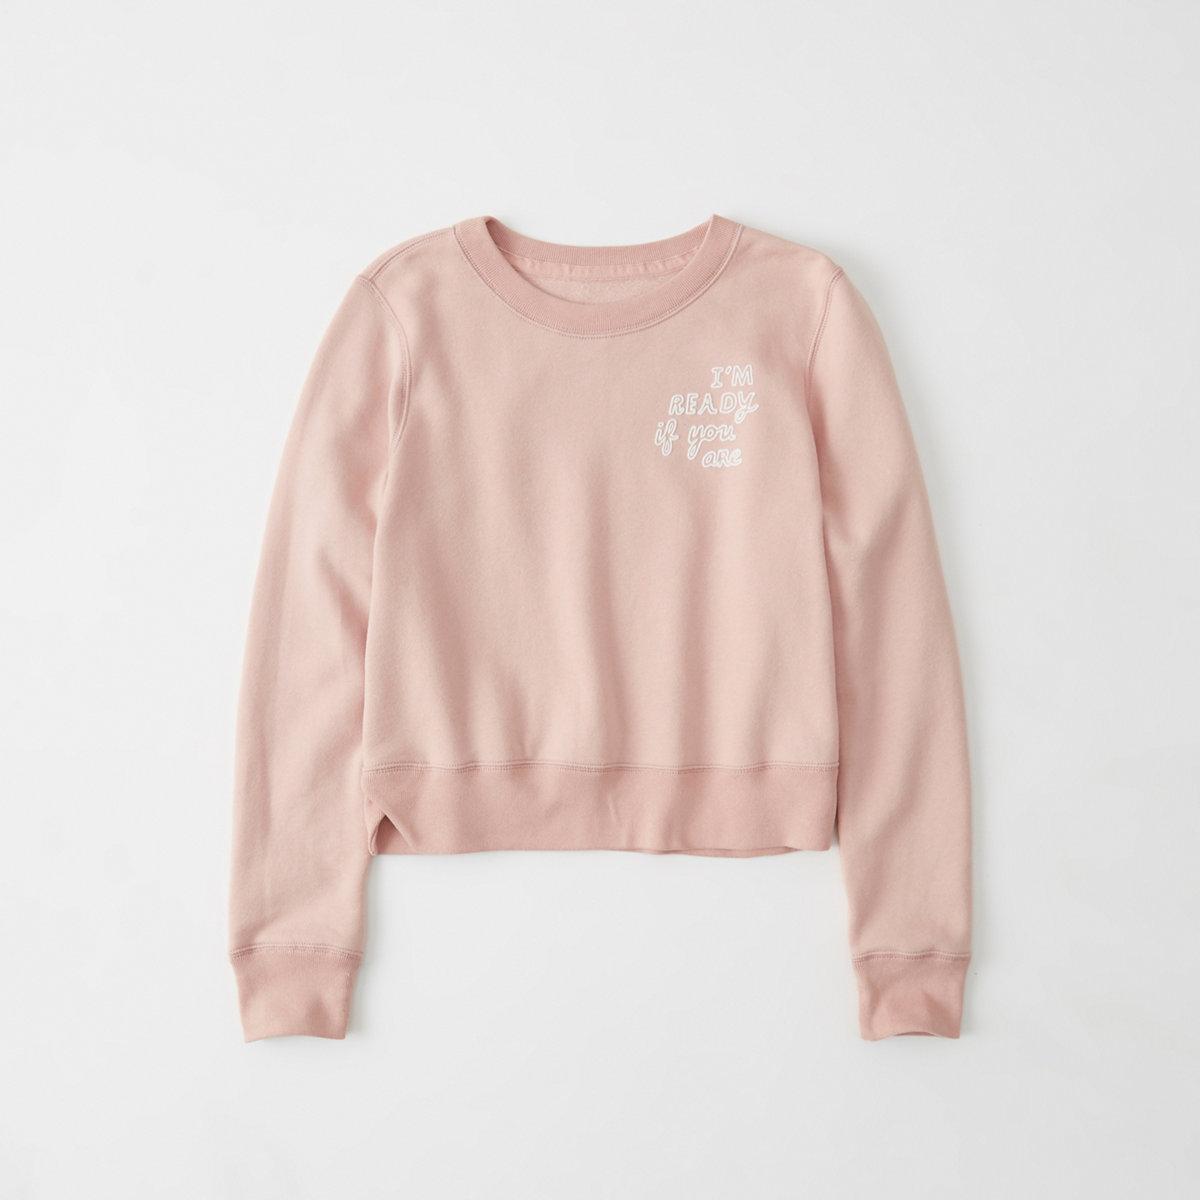 Cropped Graphic Sweatshirt